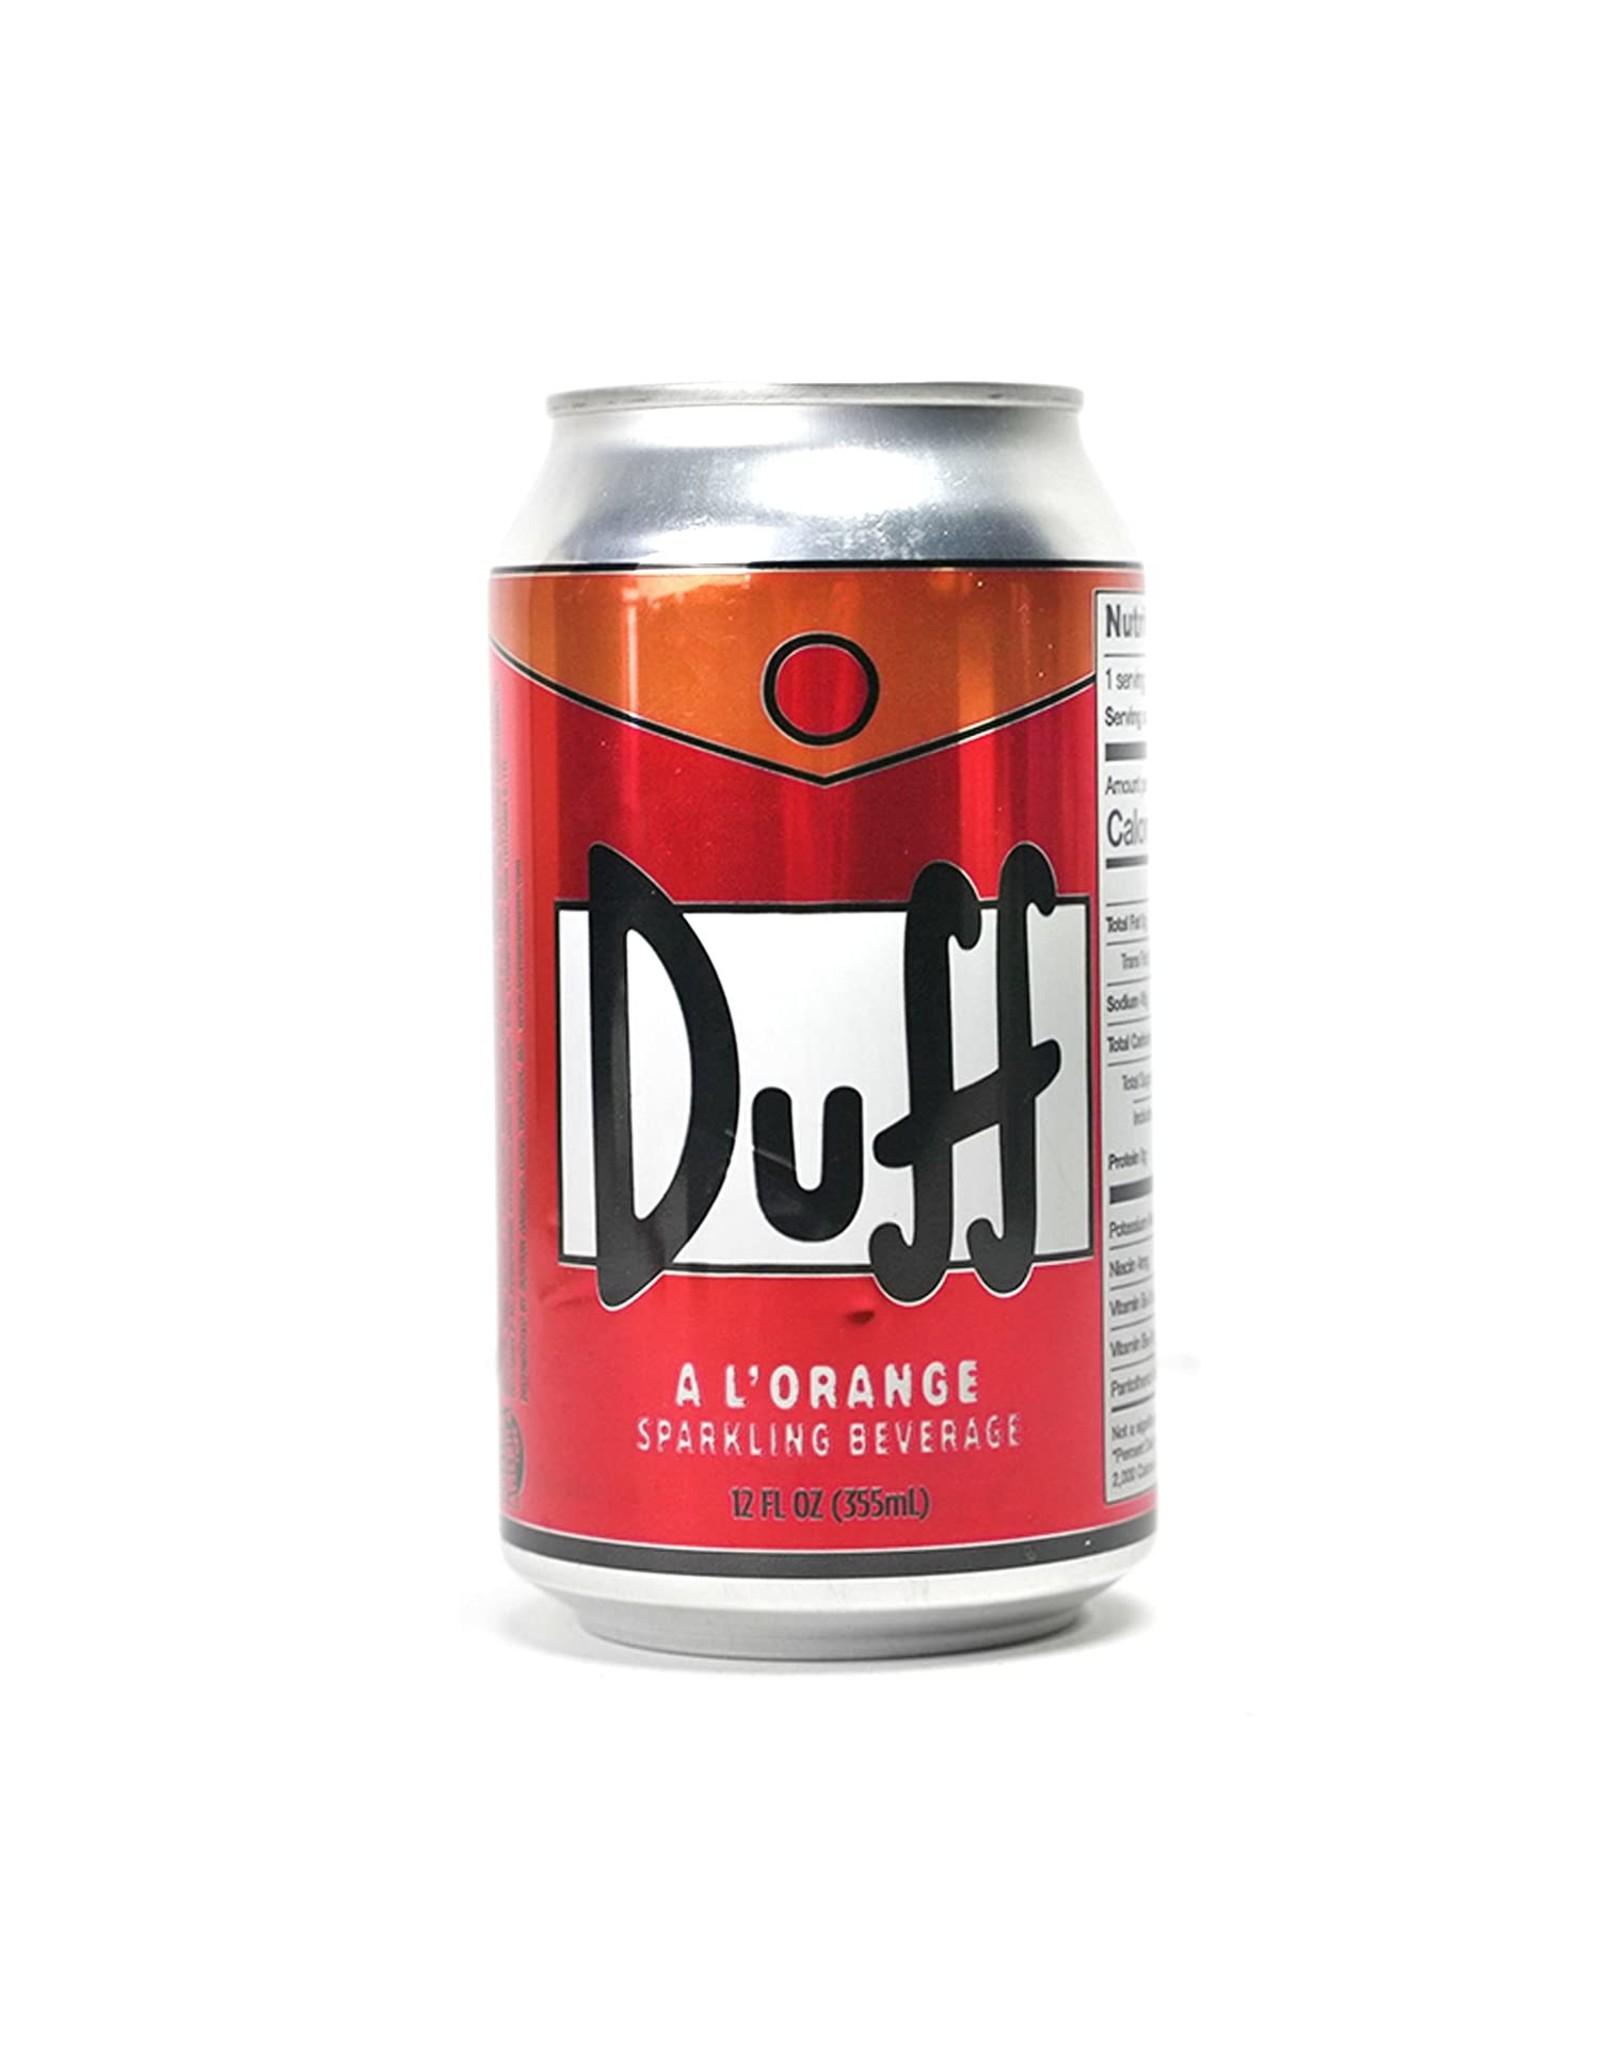 Duff a l'orange Soda - The Simpsons - 355ml